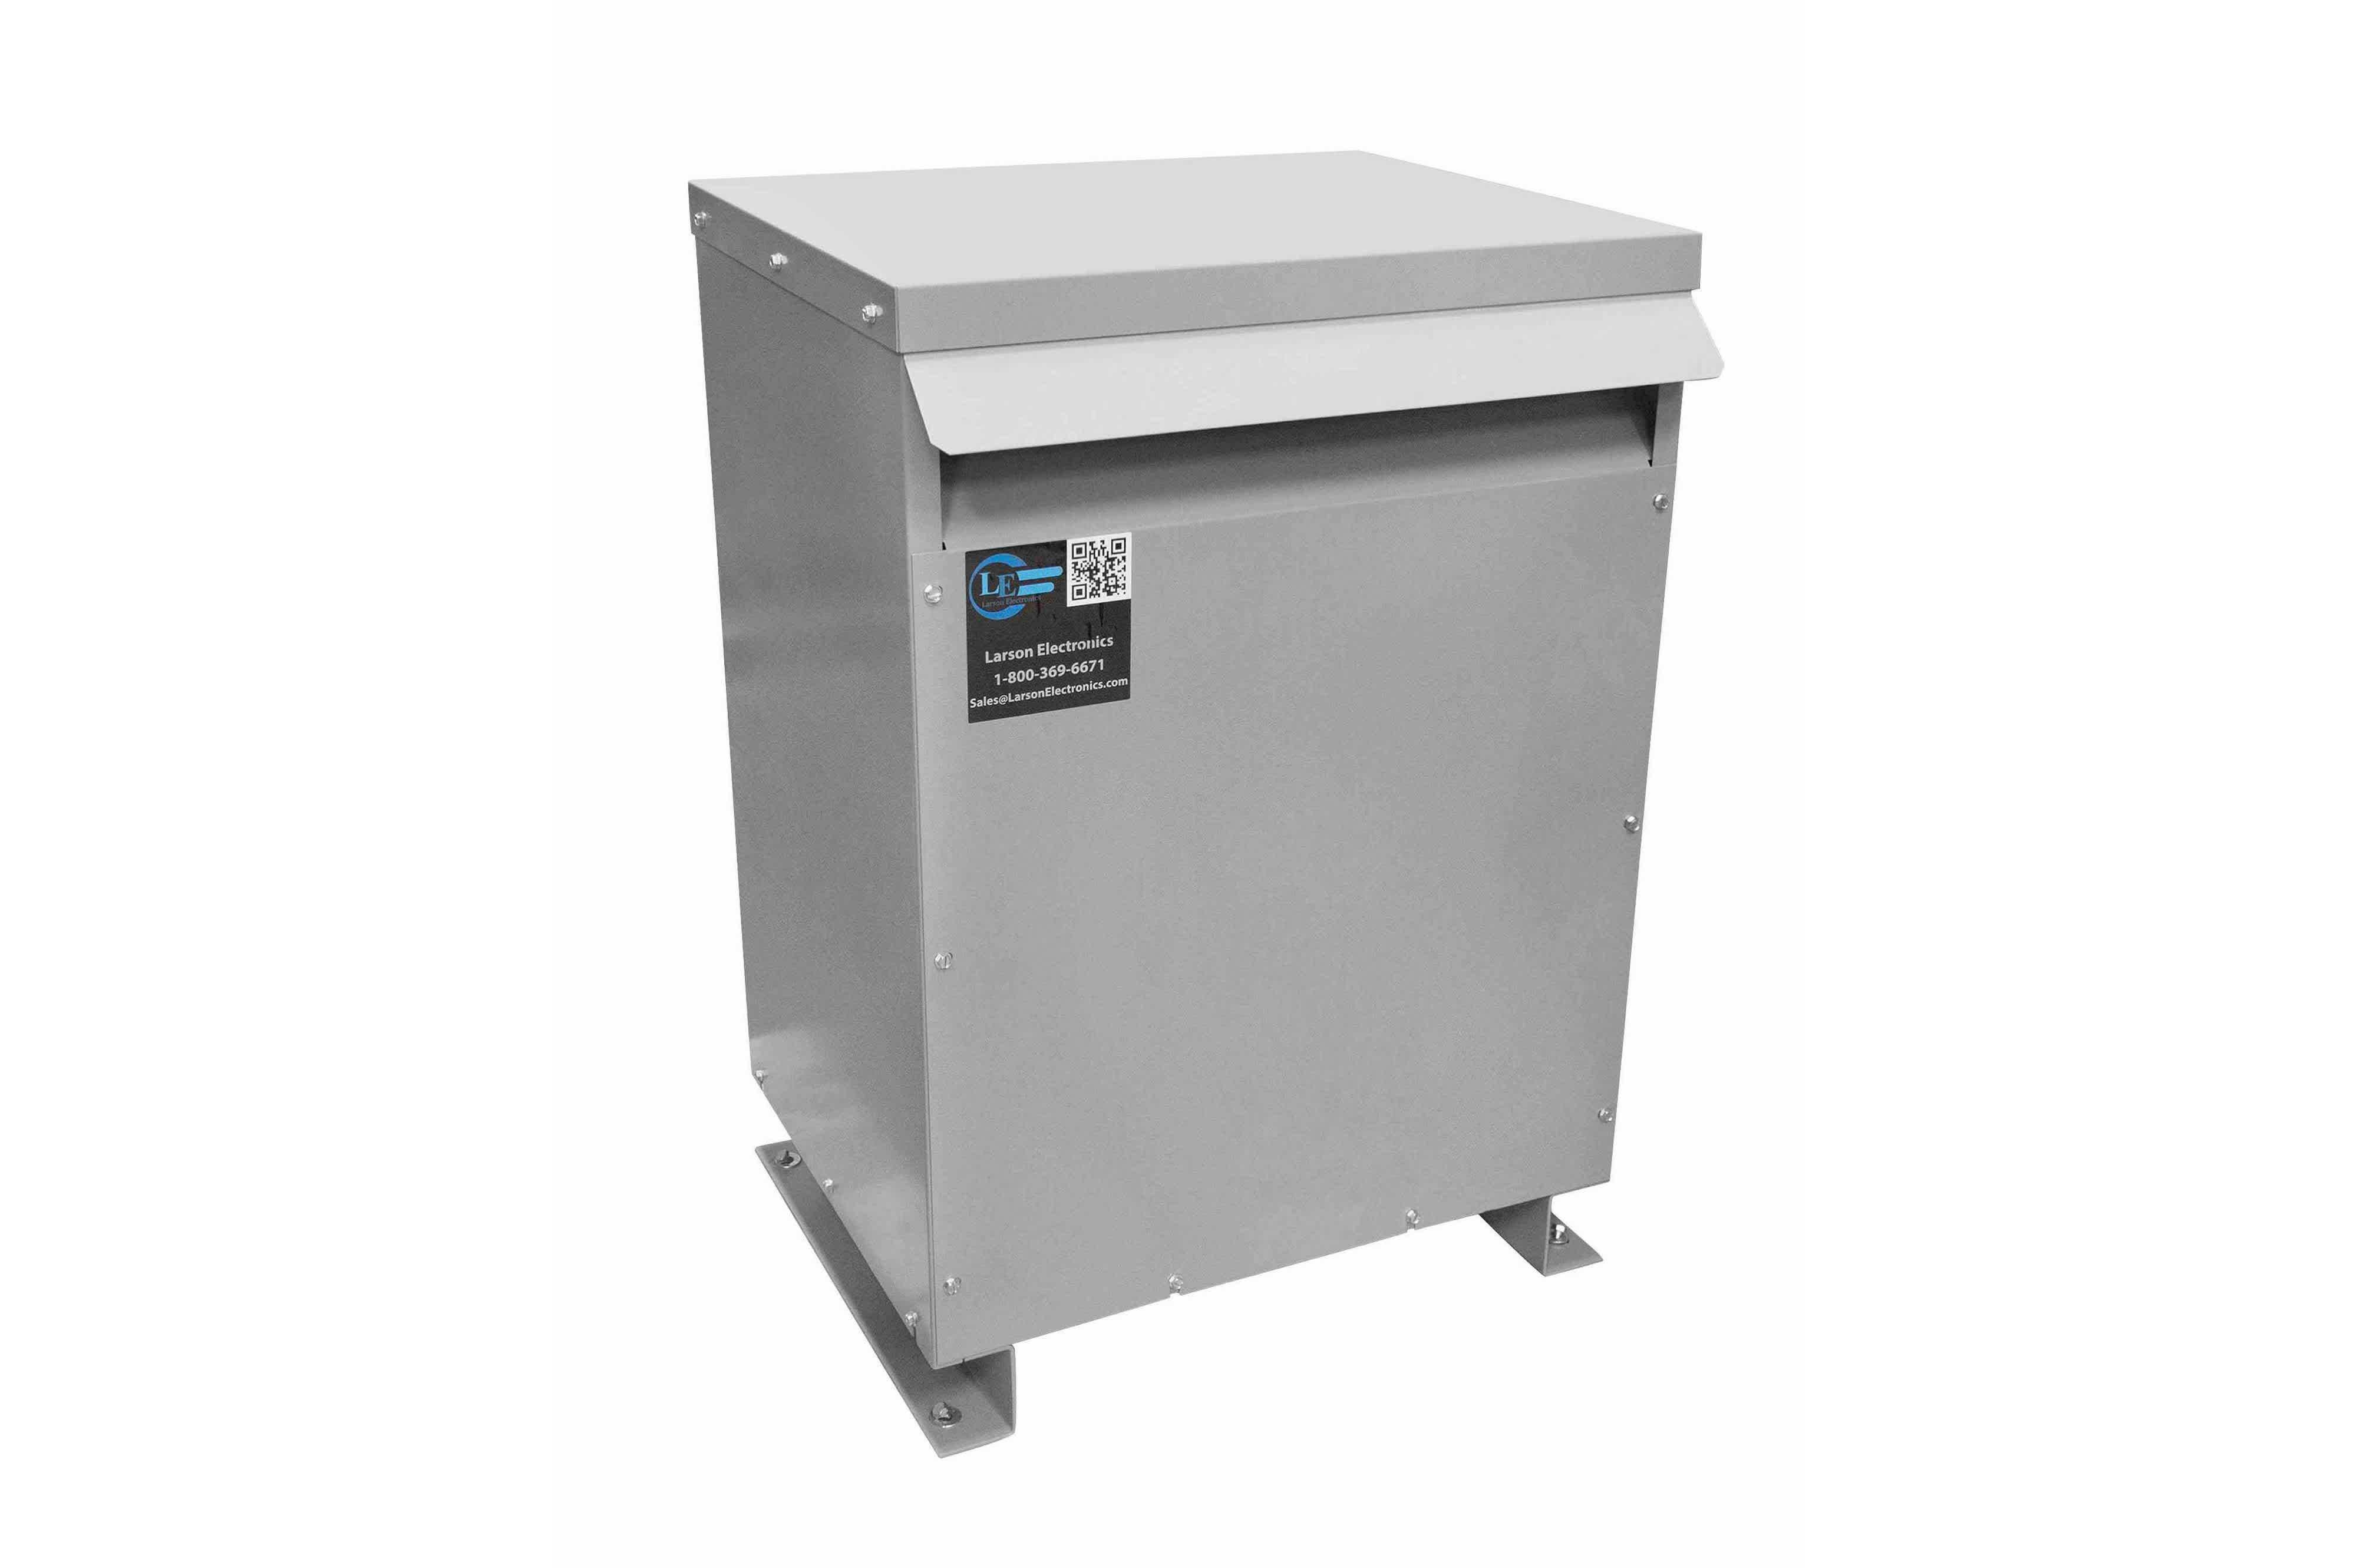 37.5 kVA 3PH Isolation Transformer, 400V Wye Primary, 240V/120 Delta Secondary, N3R, Ventilated, 60 Hz